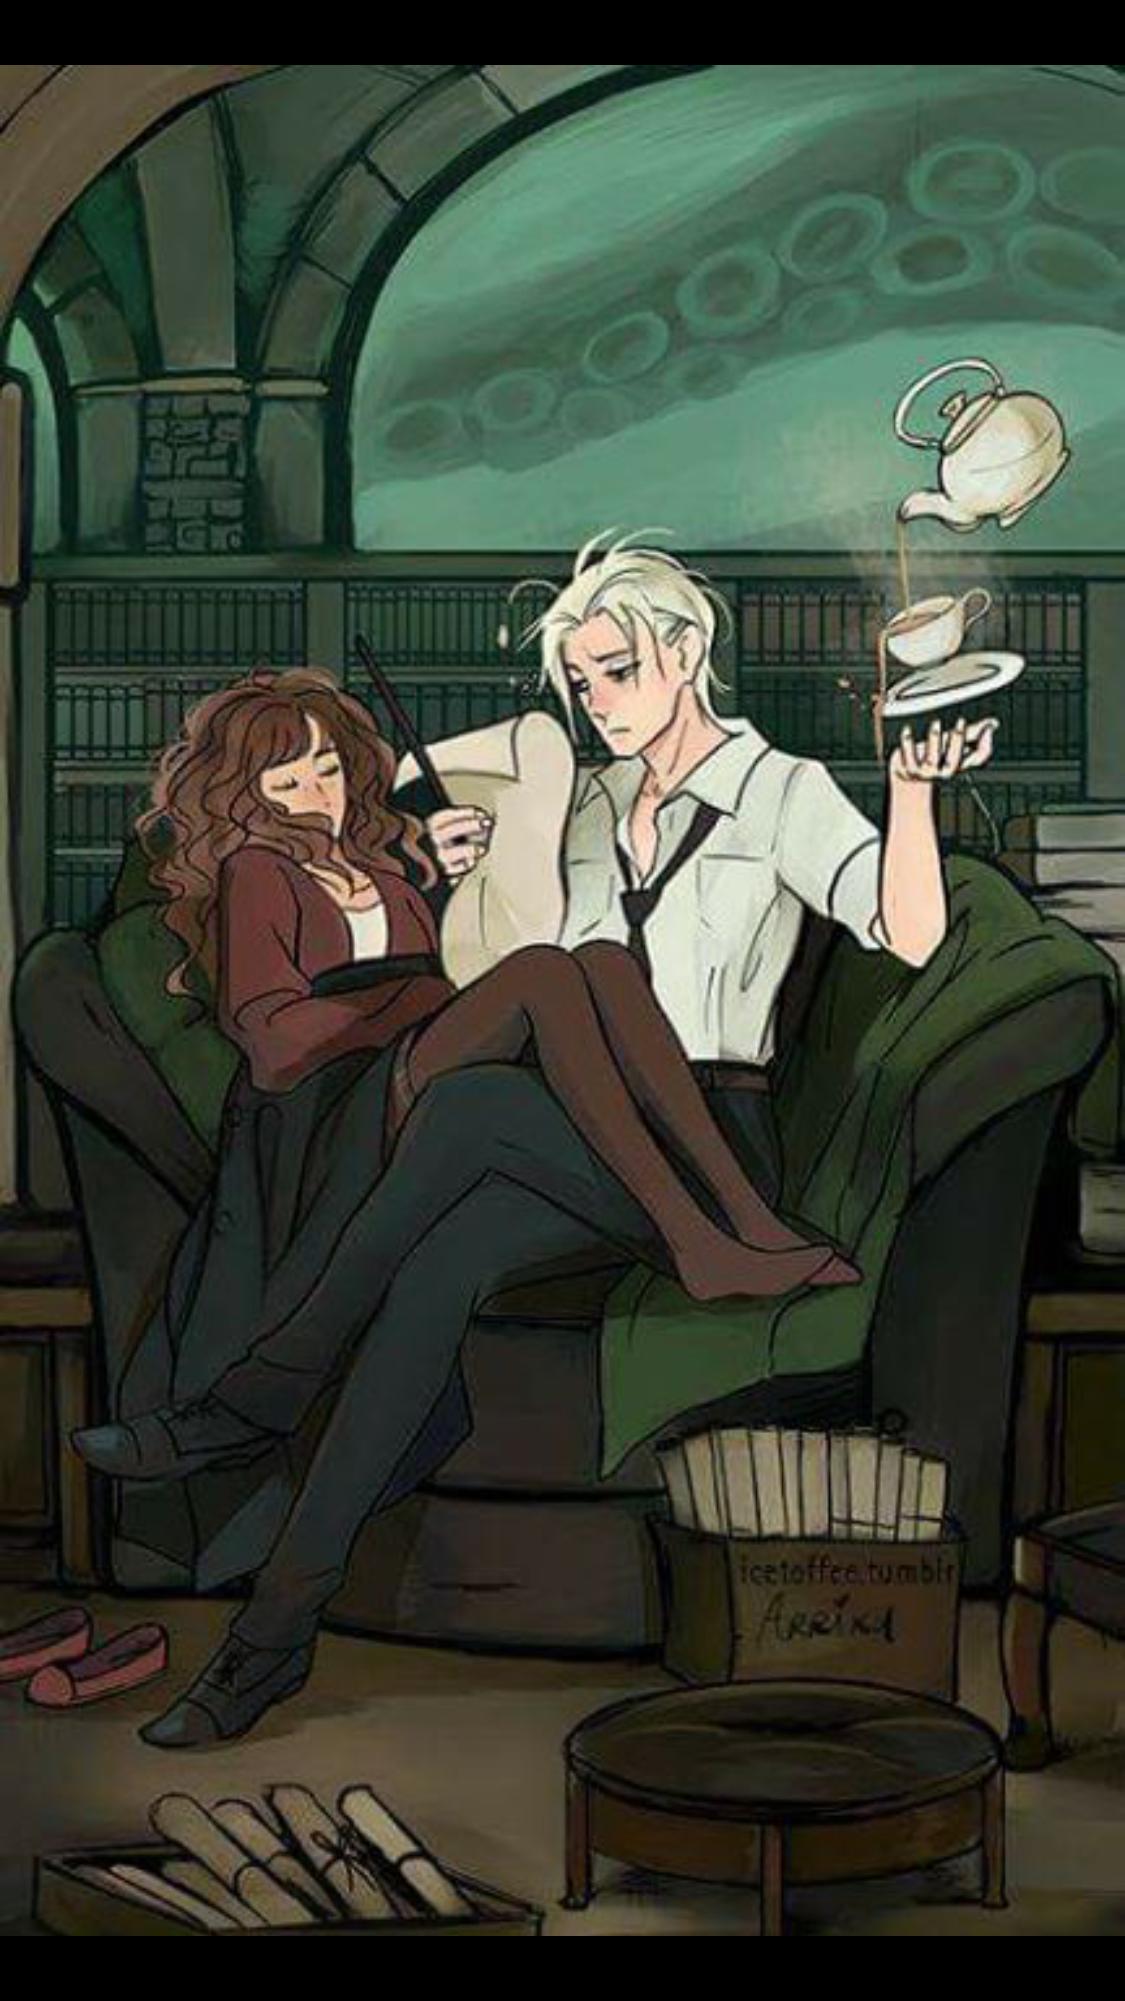 Harry Potter dessins animés de sexe